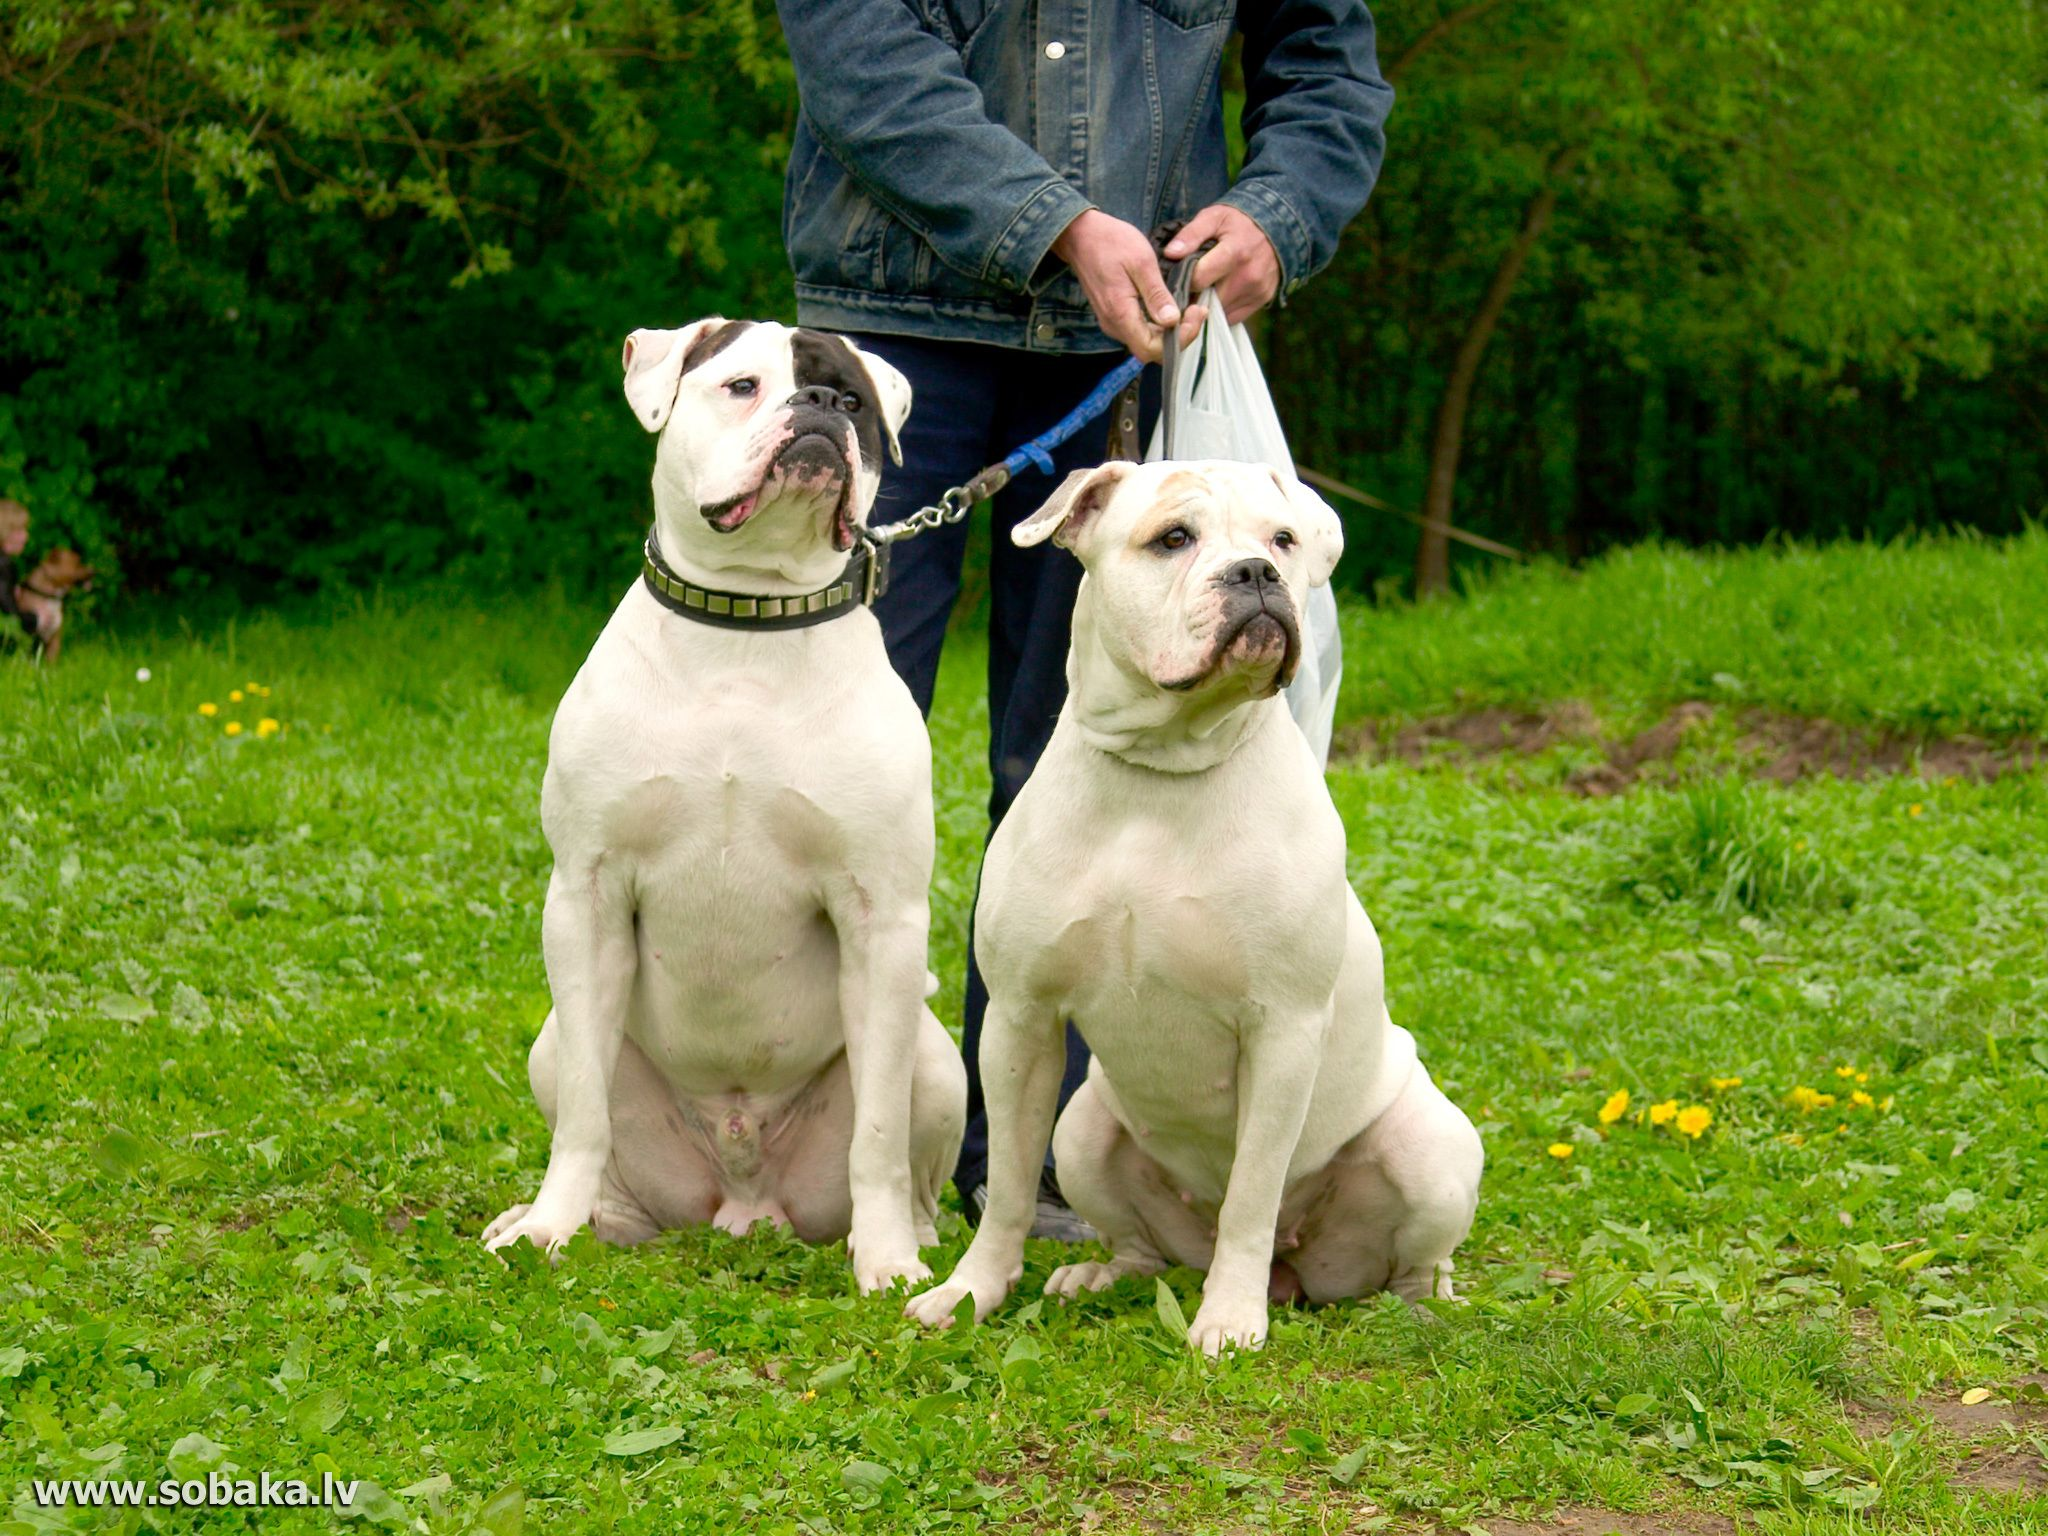 pinalex bazhan on Х american bulldog | pinterest | dogs, bulldog